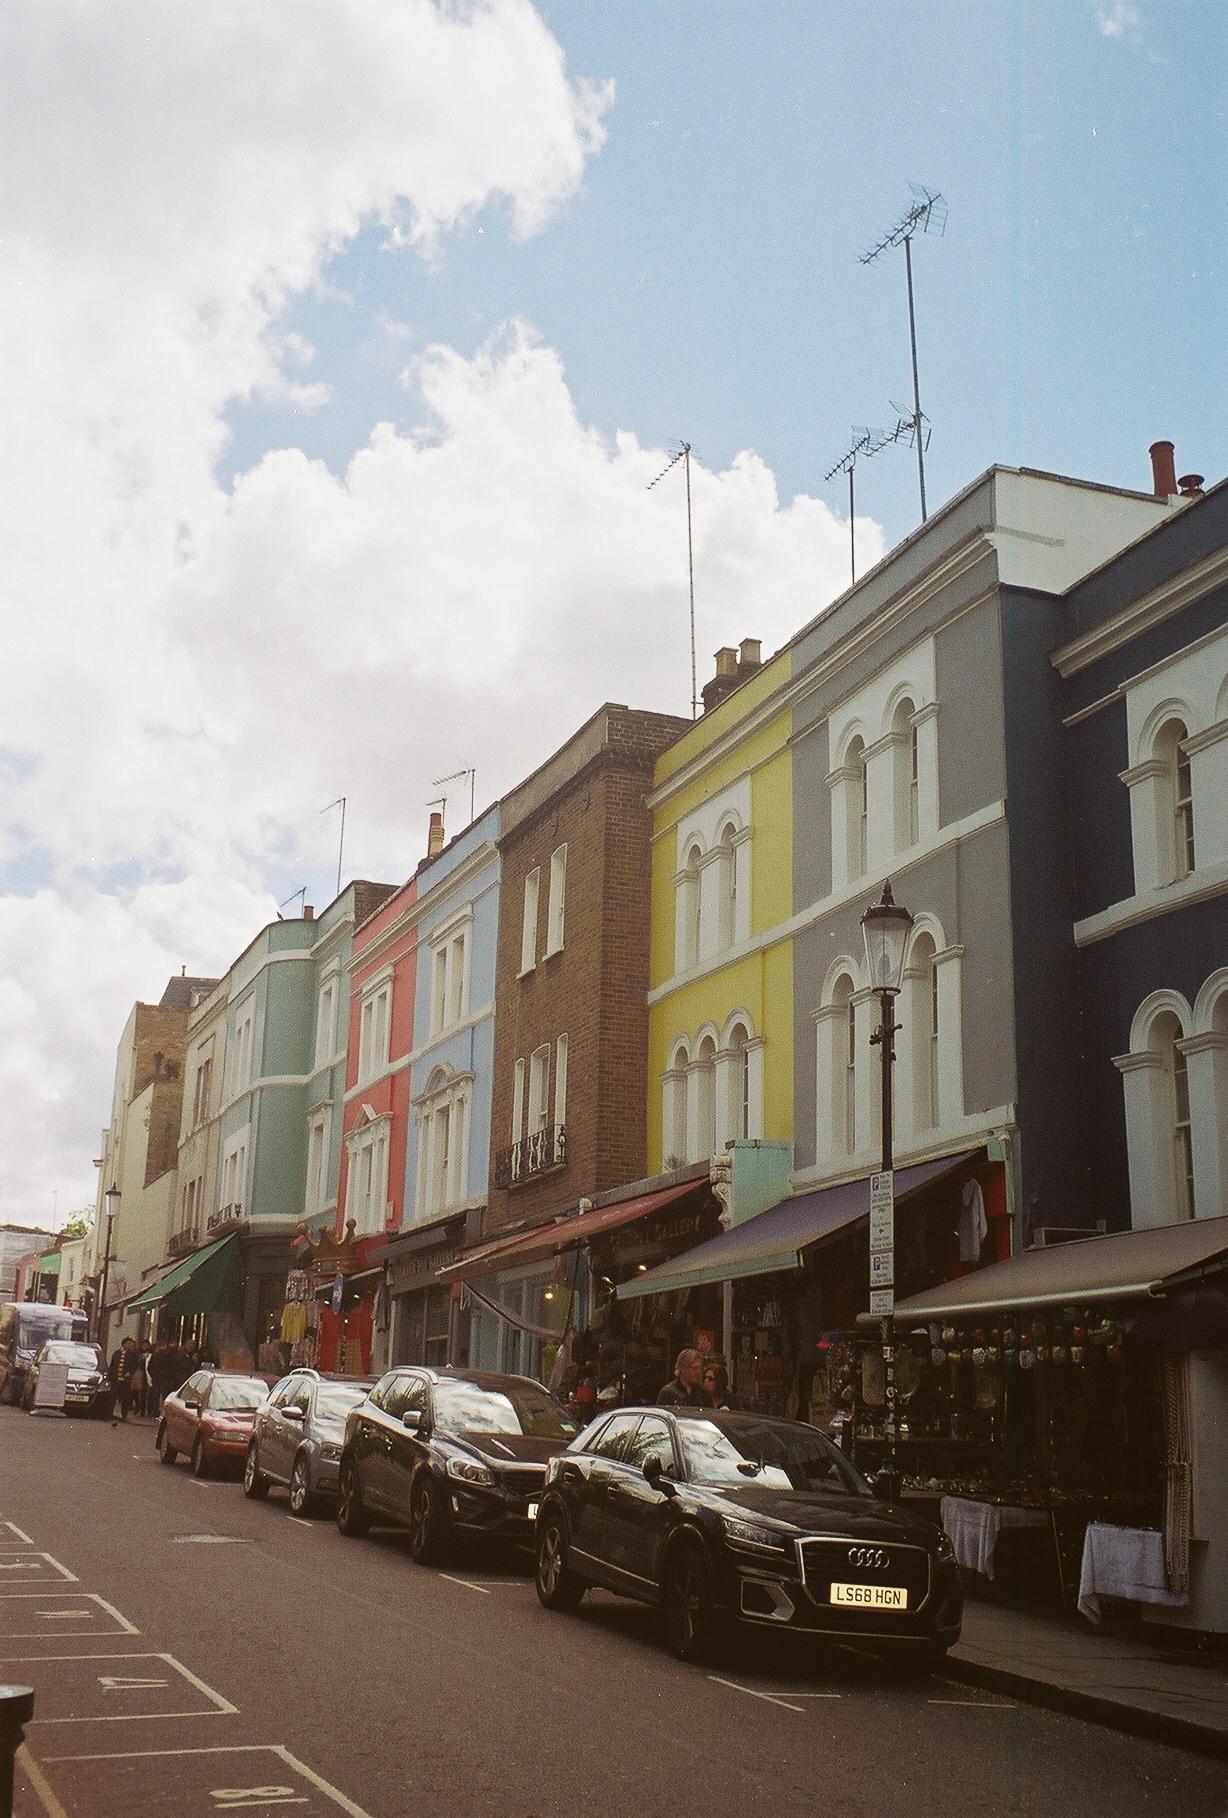 Notting Hill portobello road pastel houses